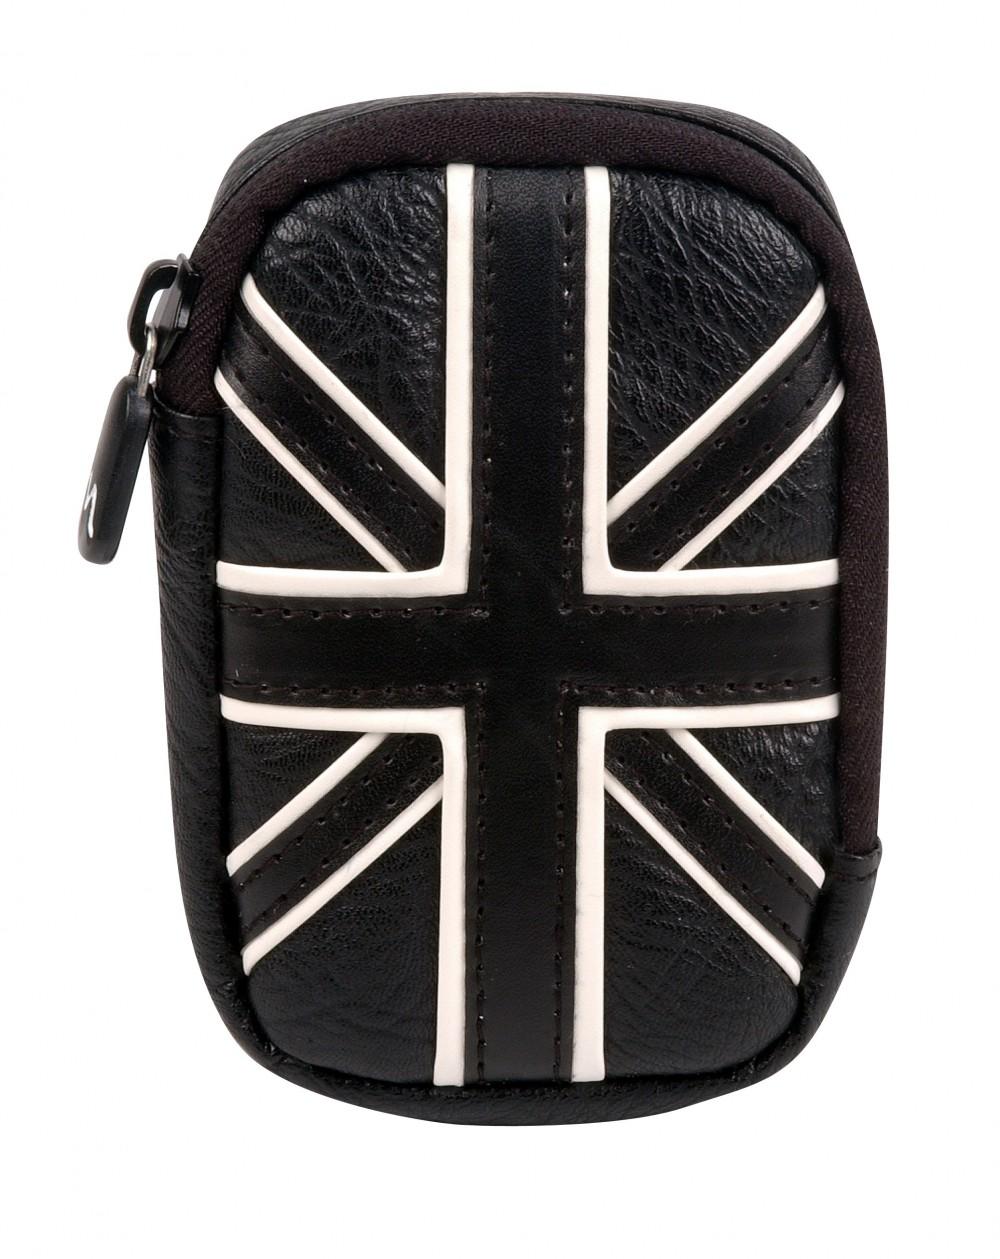 UK BLACK EDITION-CAMERA APN, L